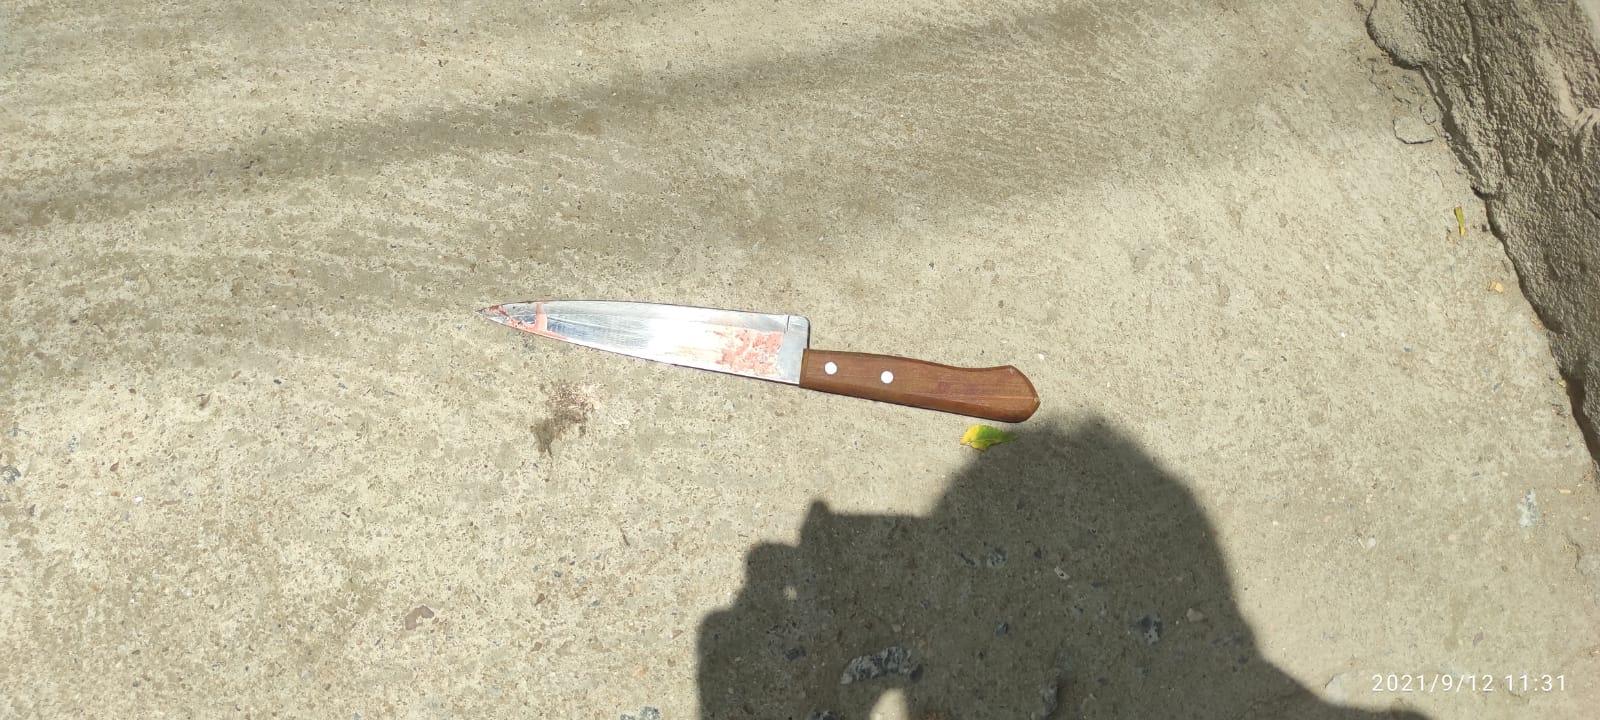 (Arma usadano crime)